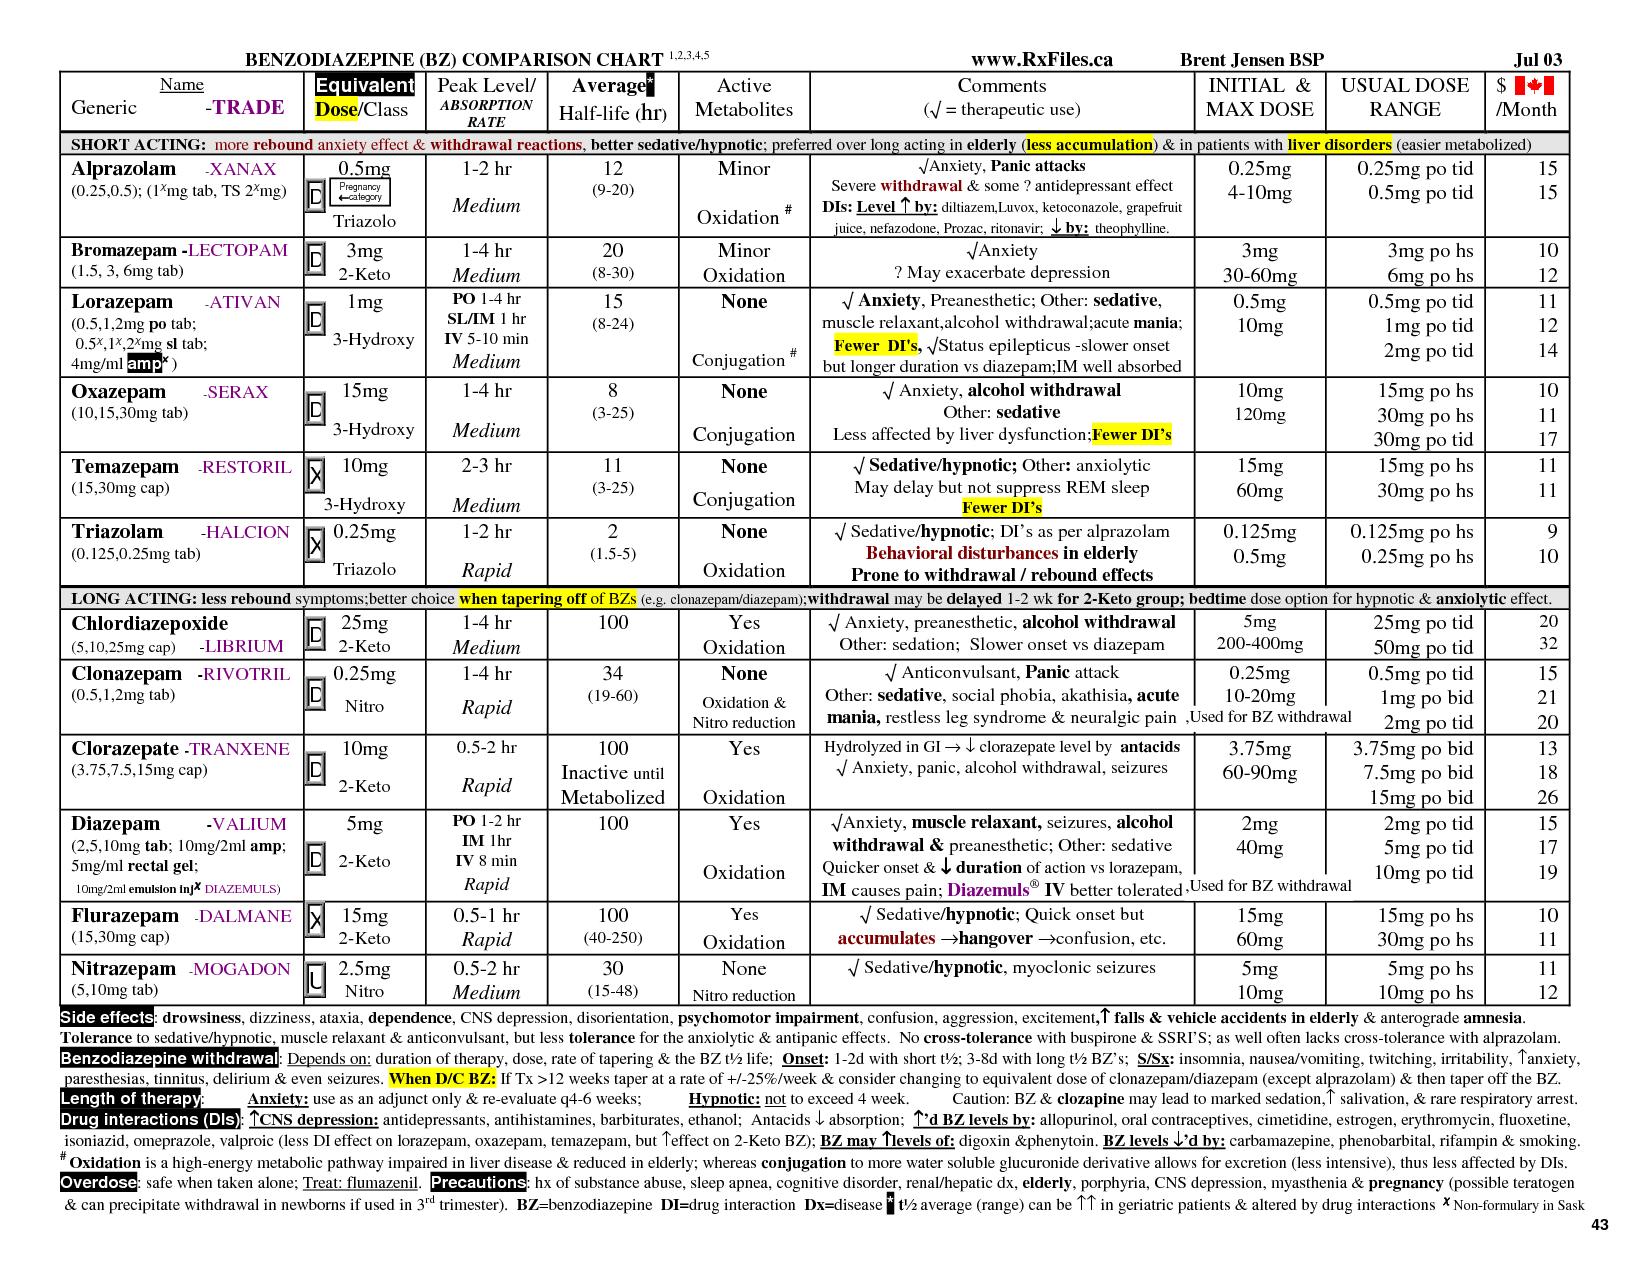 Benzodiazepine Equivalency Chart Comparison